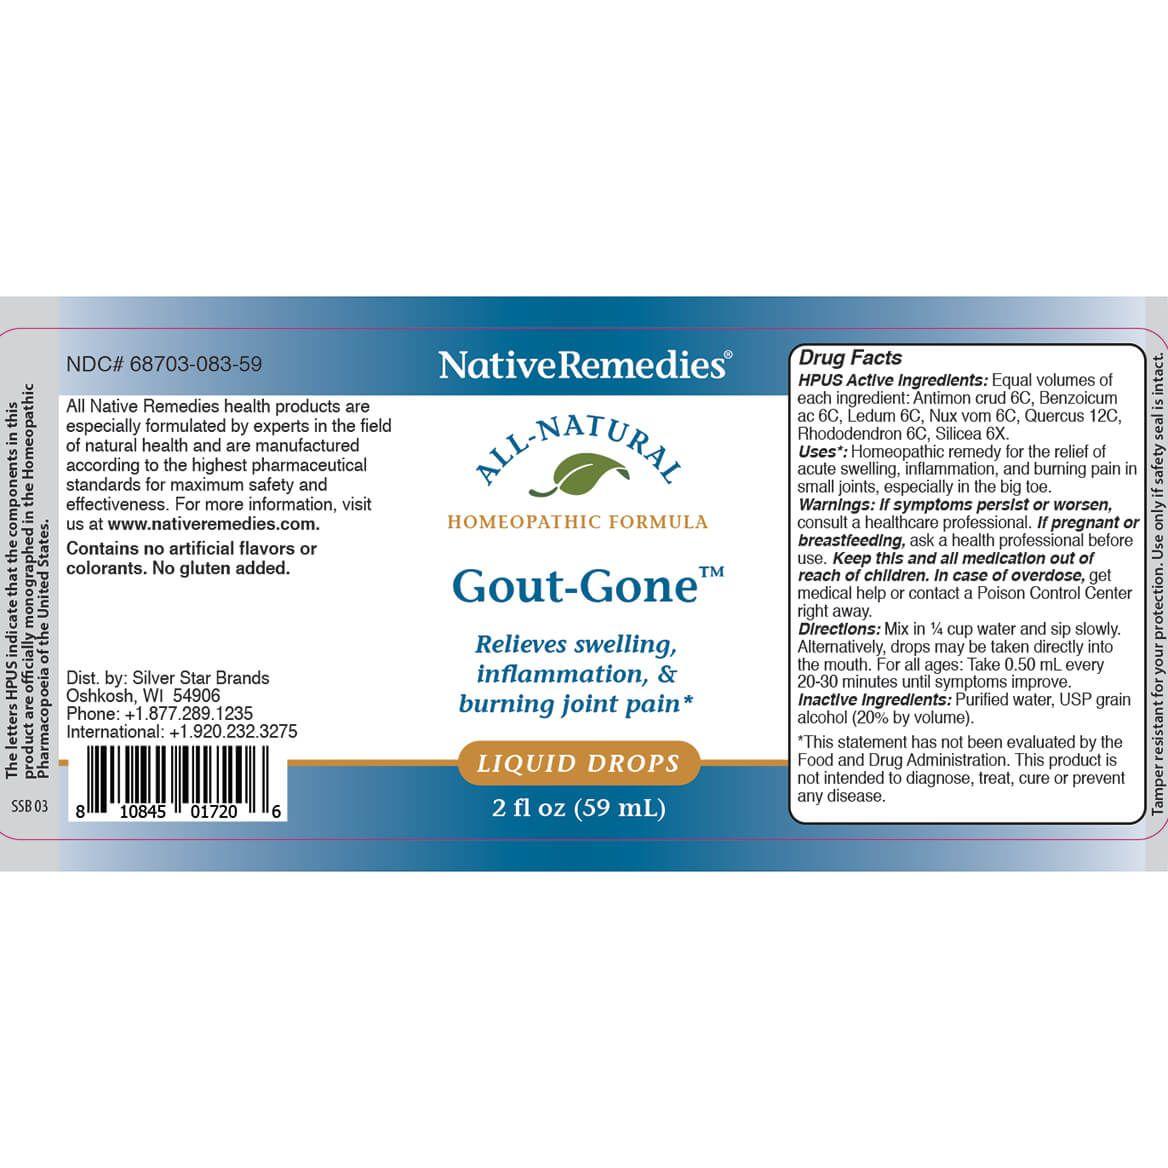 NativeRemedies® Gout-Gone™-343694